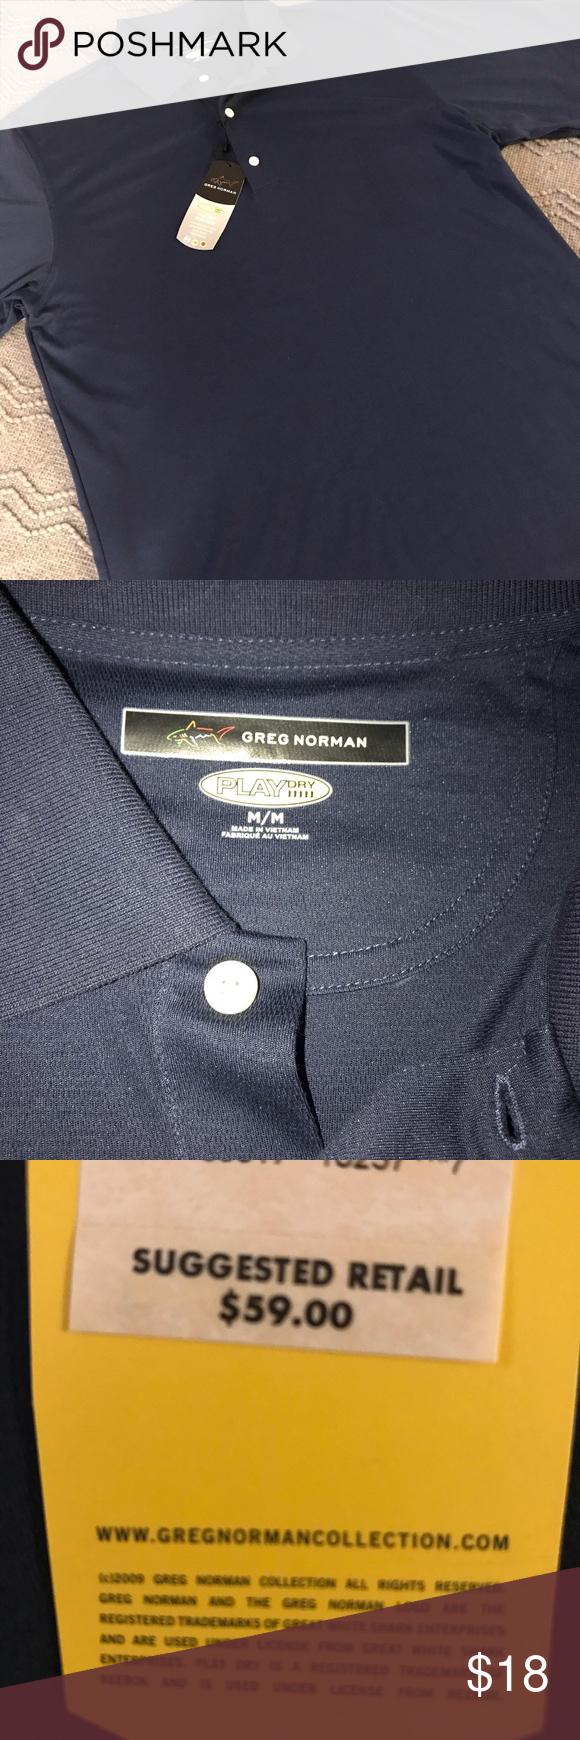 Nwt Greg Norman Playdry Golf Shirt Navy Blue Golf Shirts Clothes Design Navy Blue Color